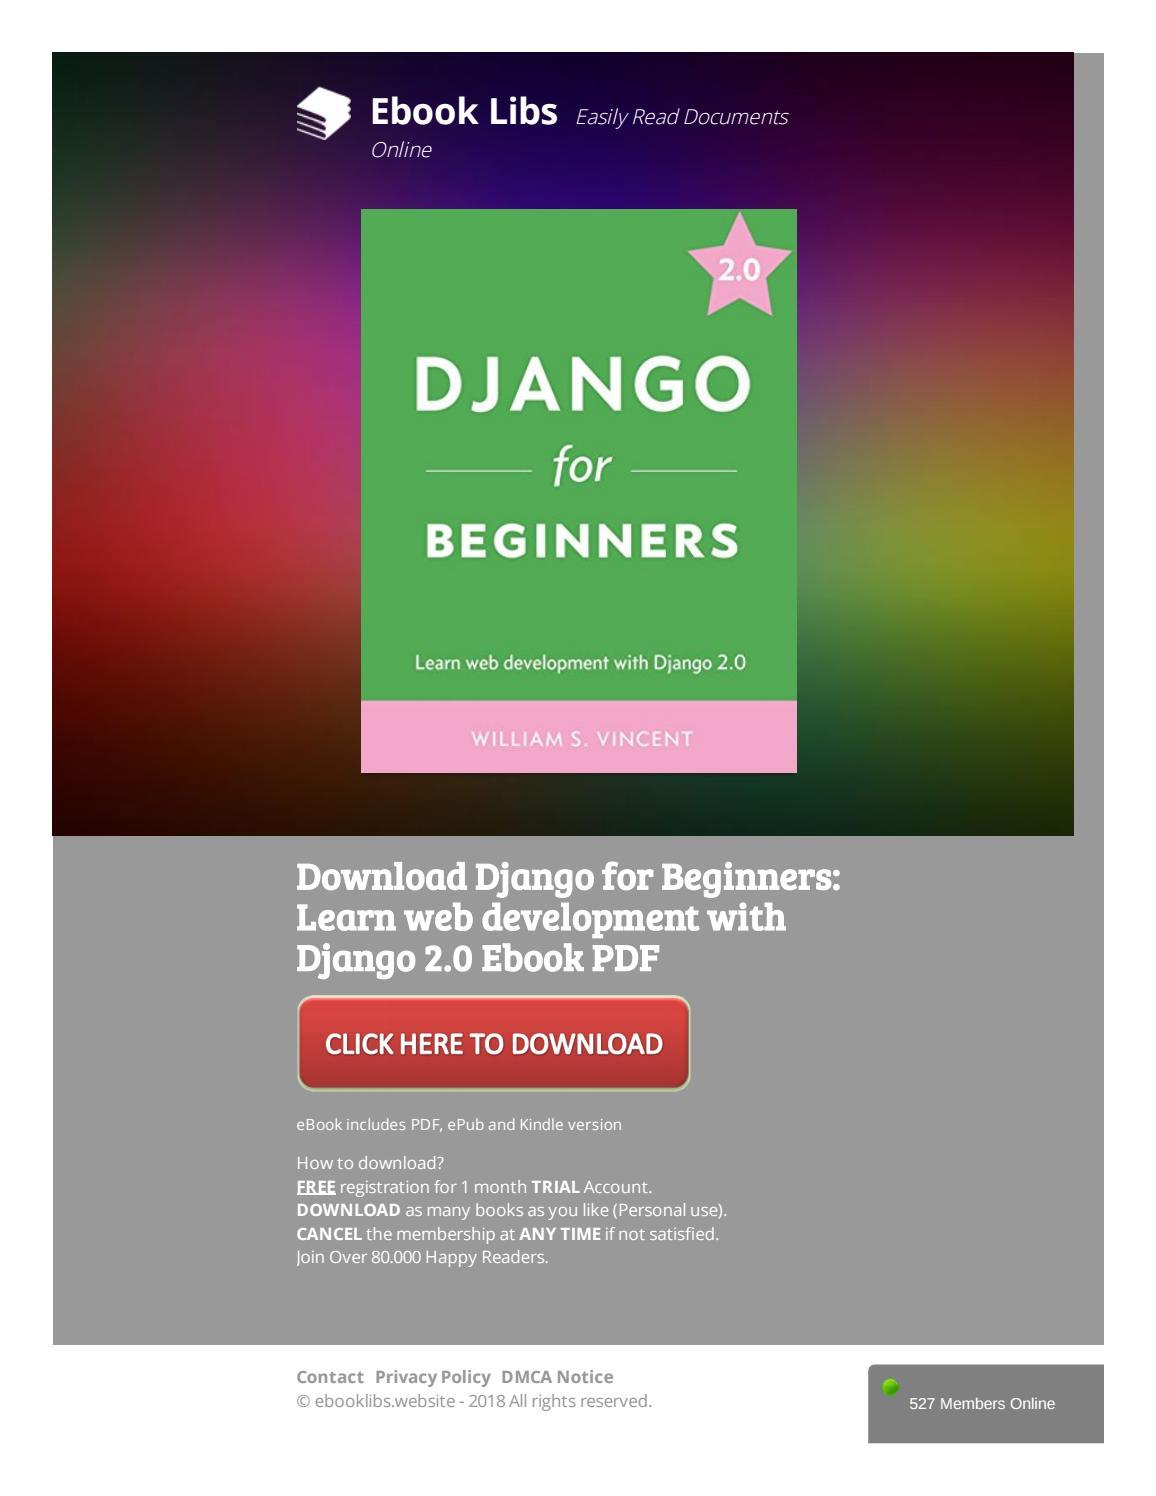 Download Django For Beginners Learn Web Development With Django 2 0 Ebook Pdf By Ad927455e8 Issuu